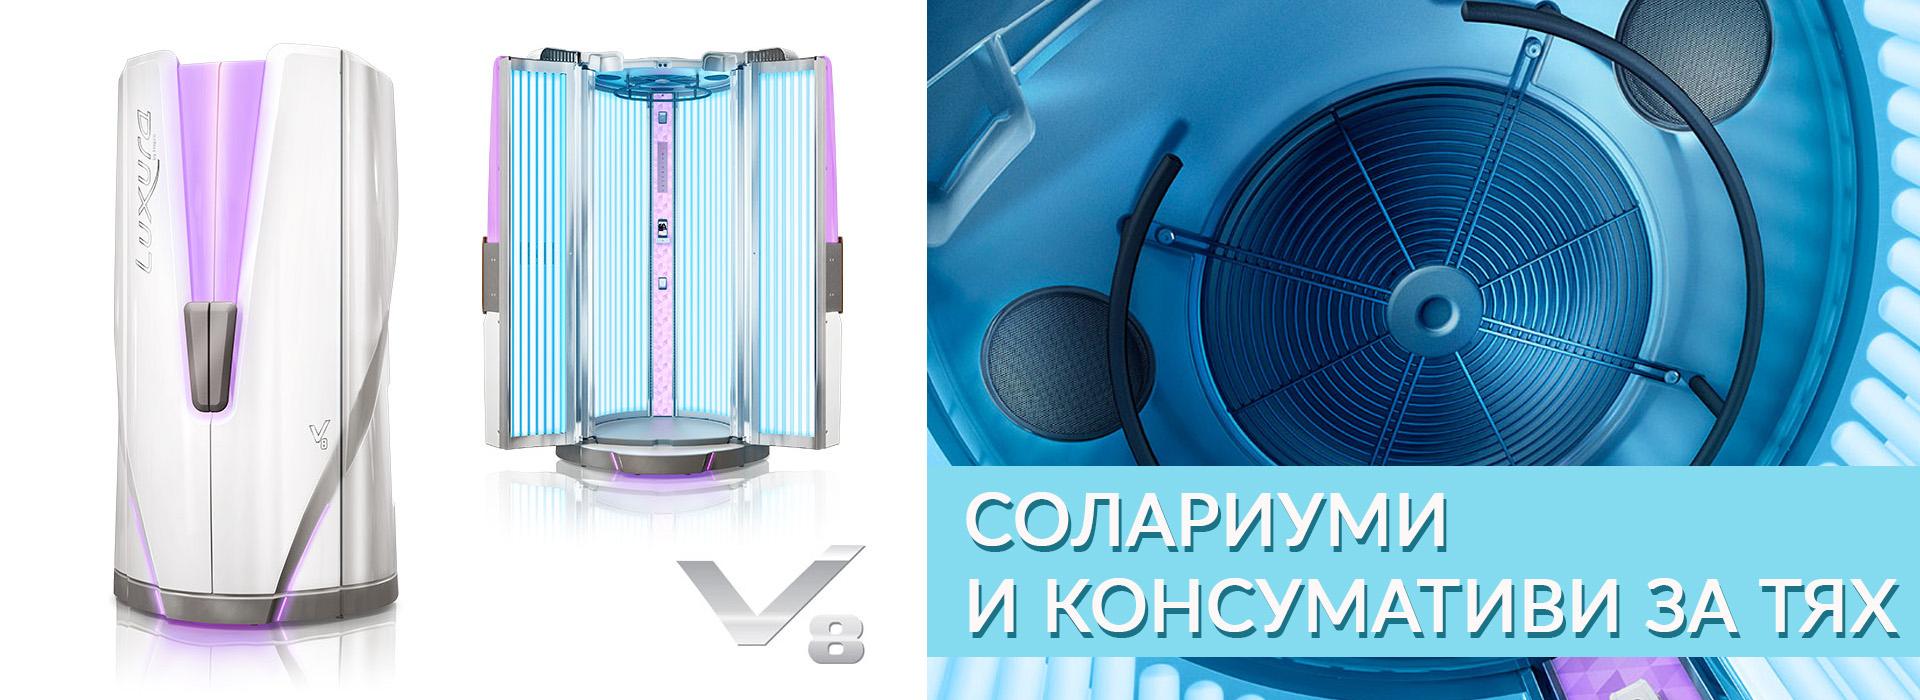 slide_noviz_11